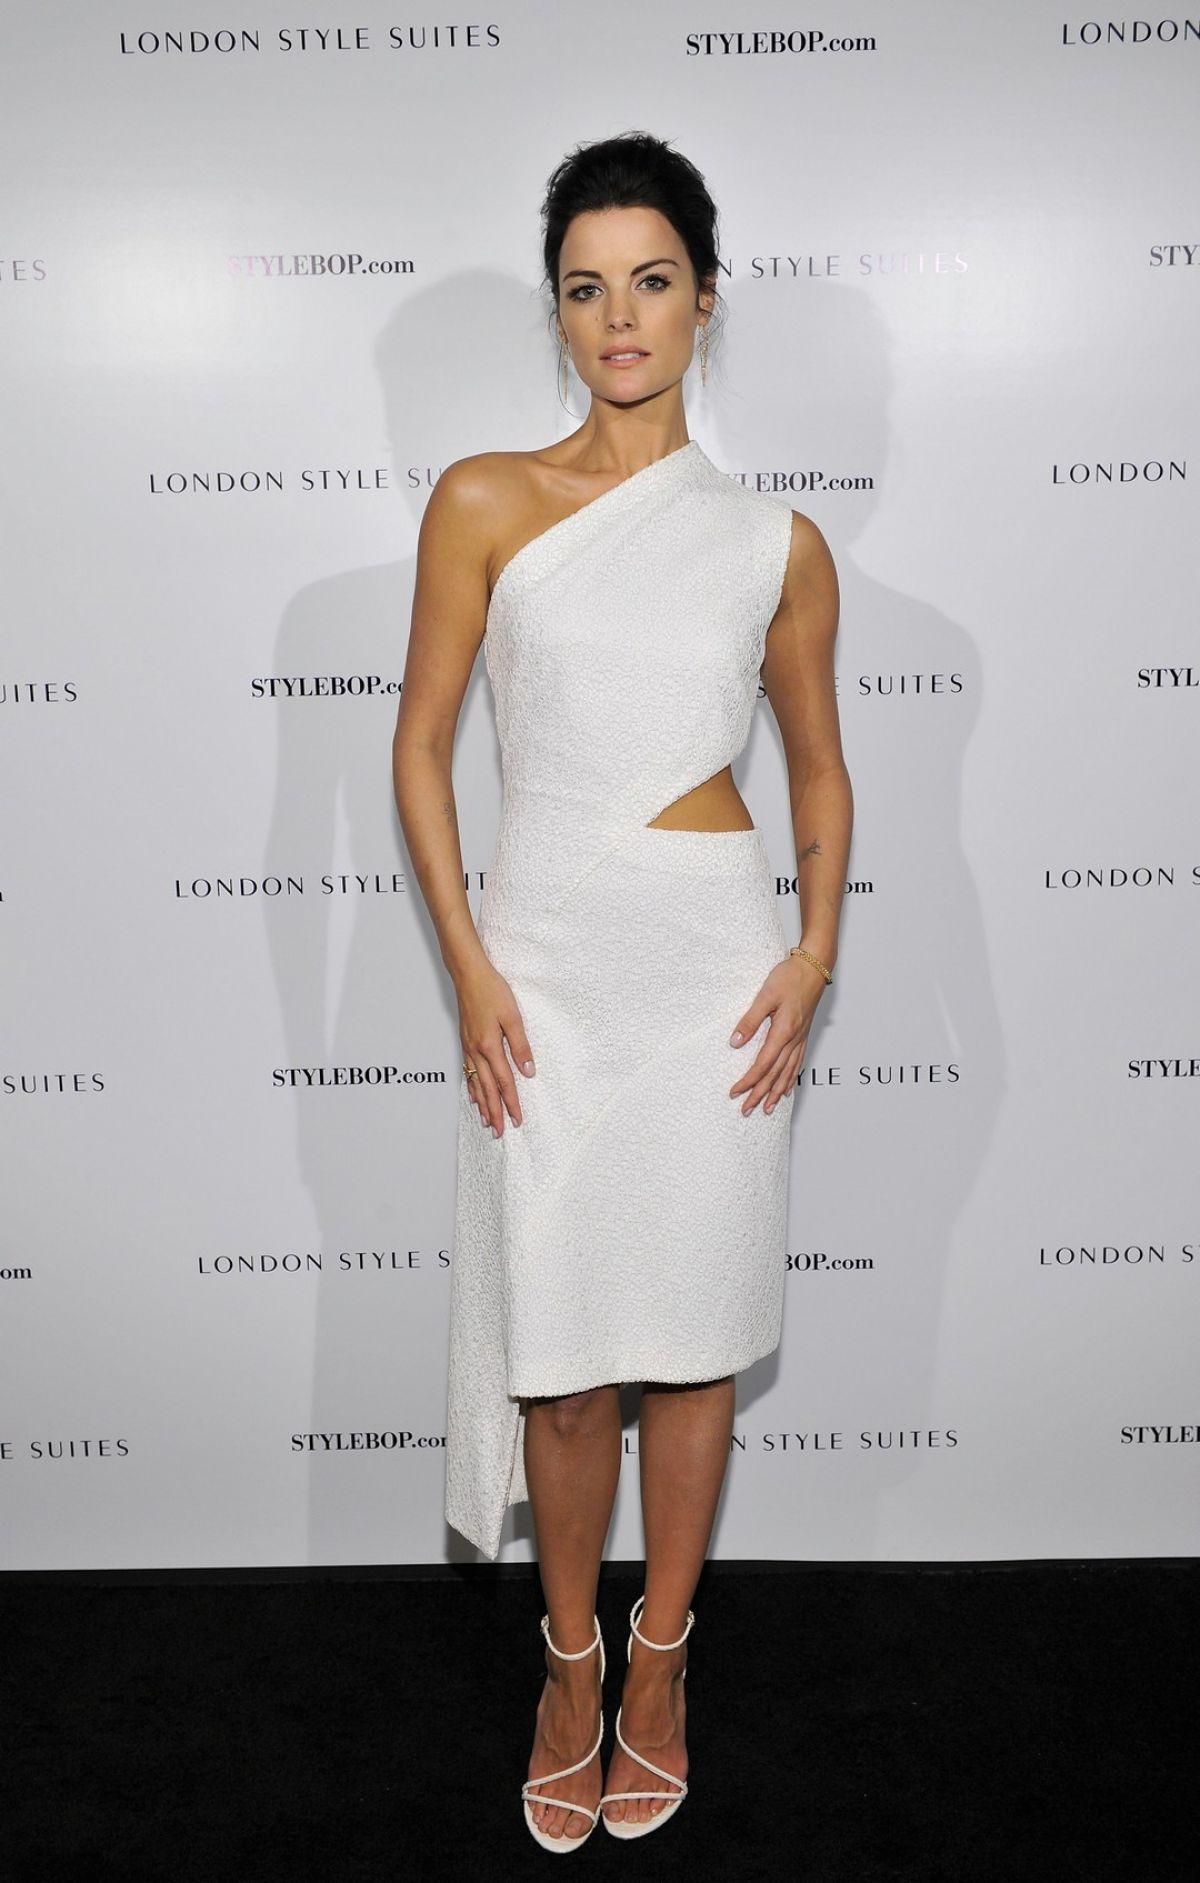 Jaimie Alexander / British Fashion Council Stylebop.com Party